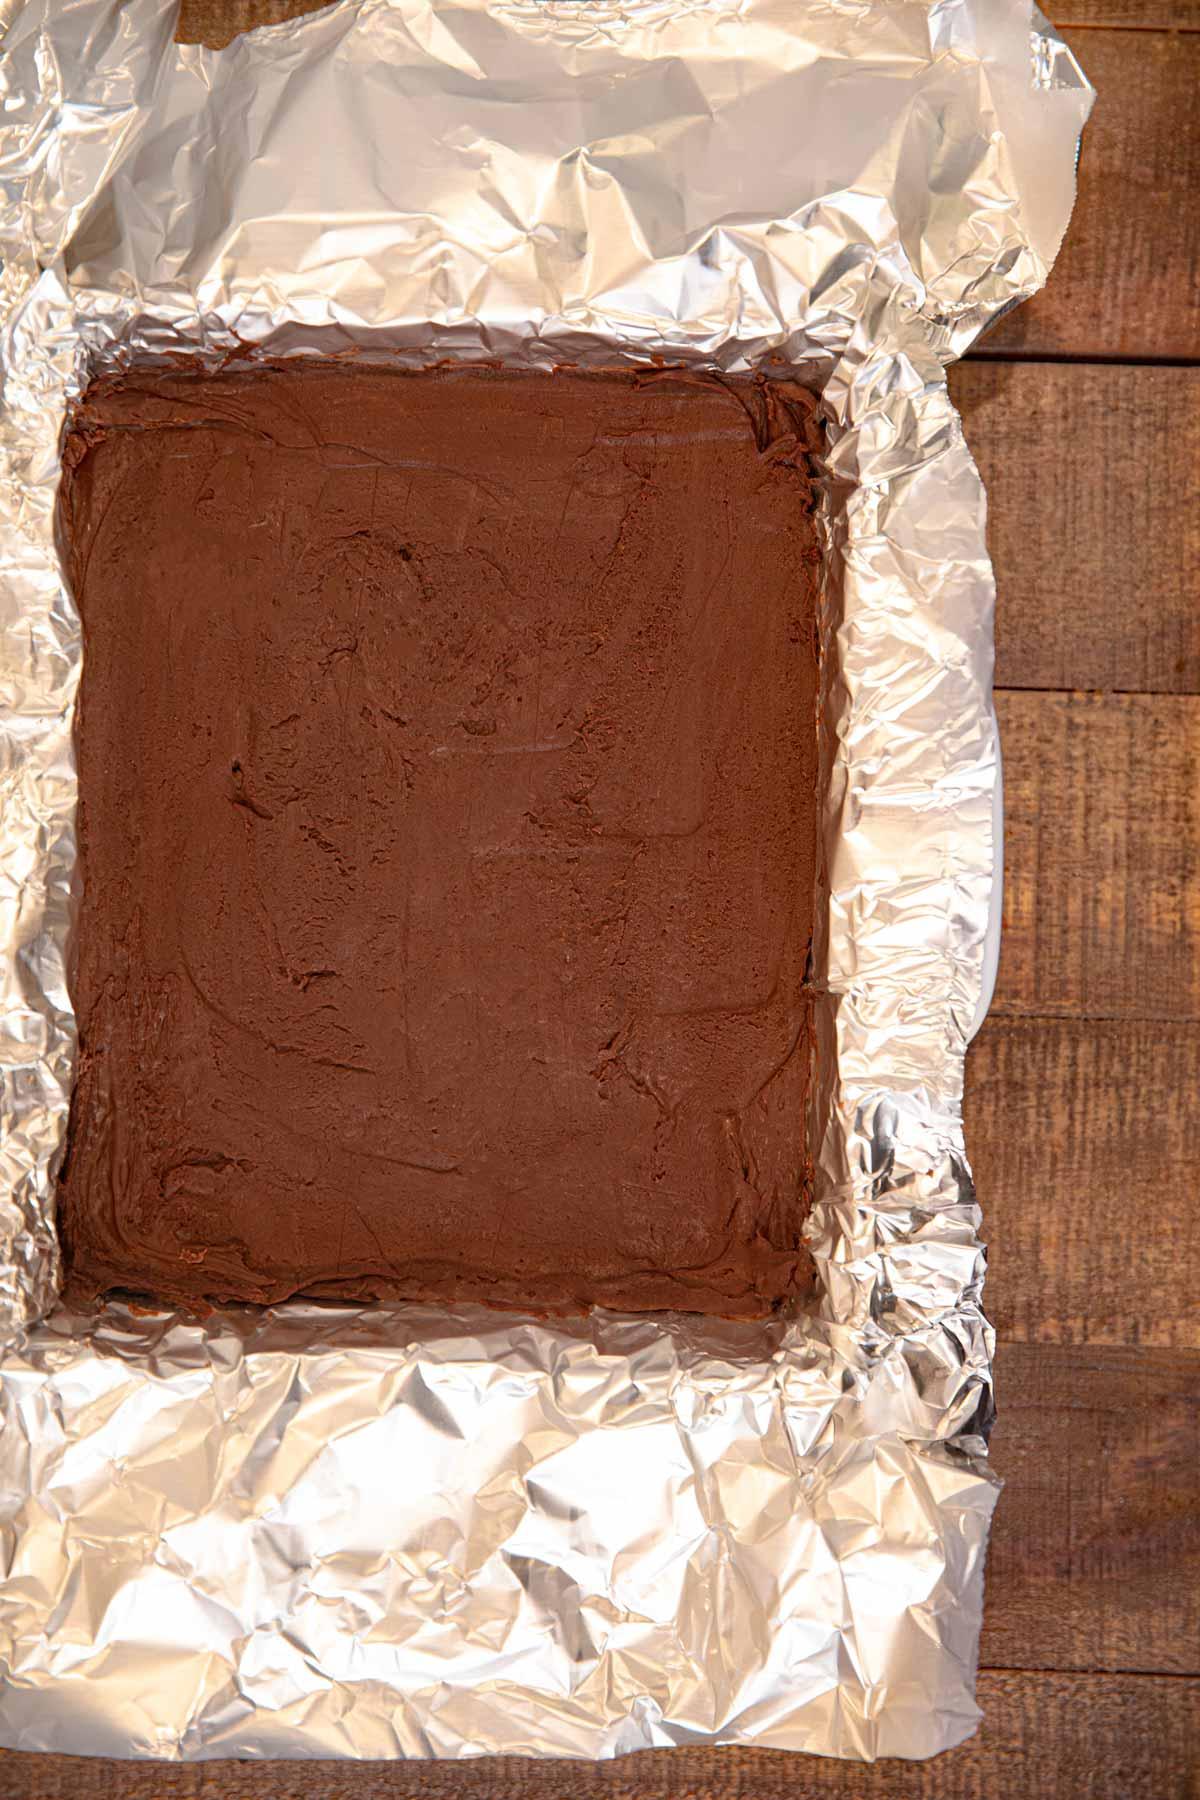 Dark Chocolate Orange Fudge in baking pan with foil